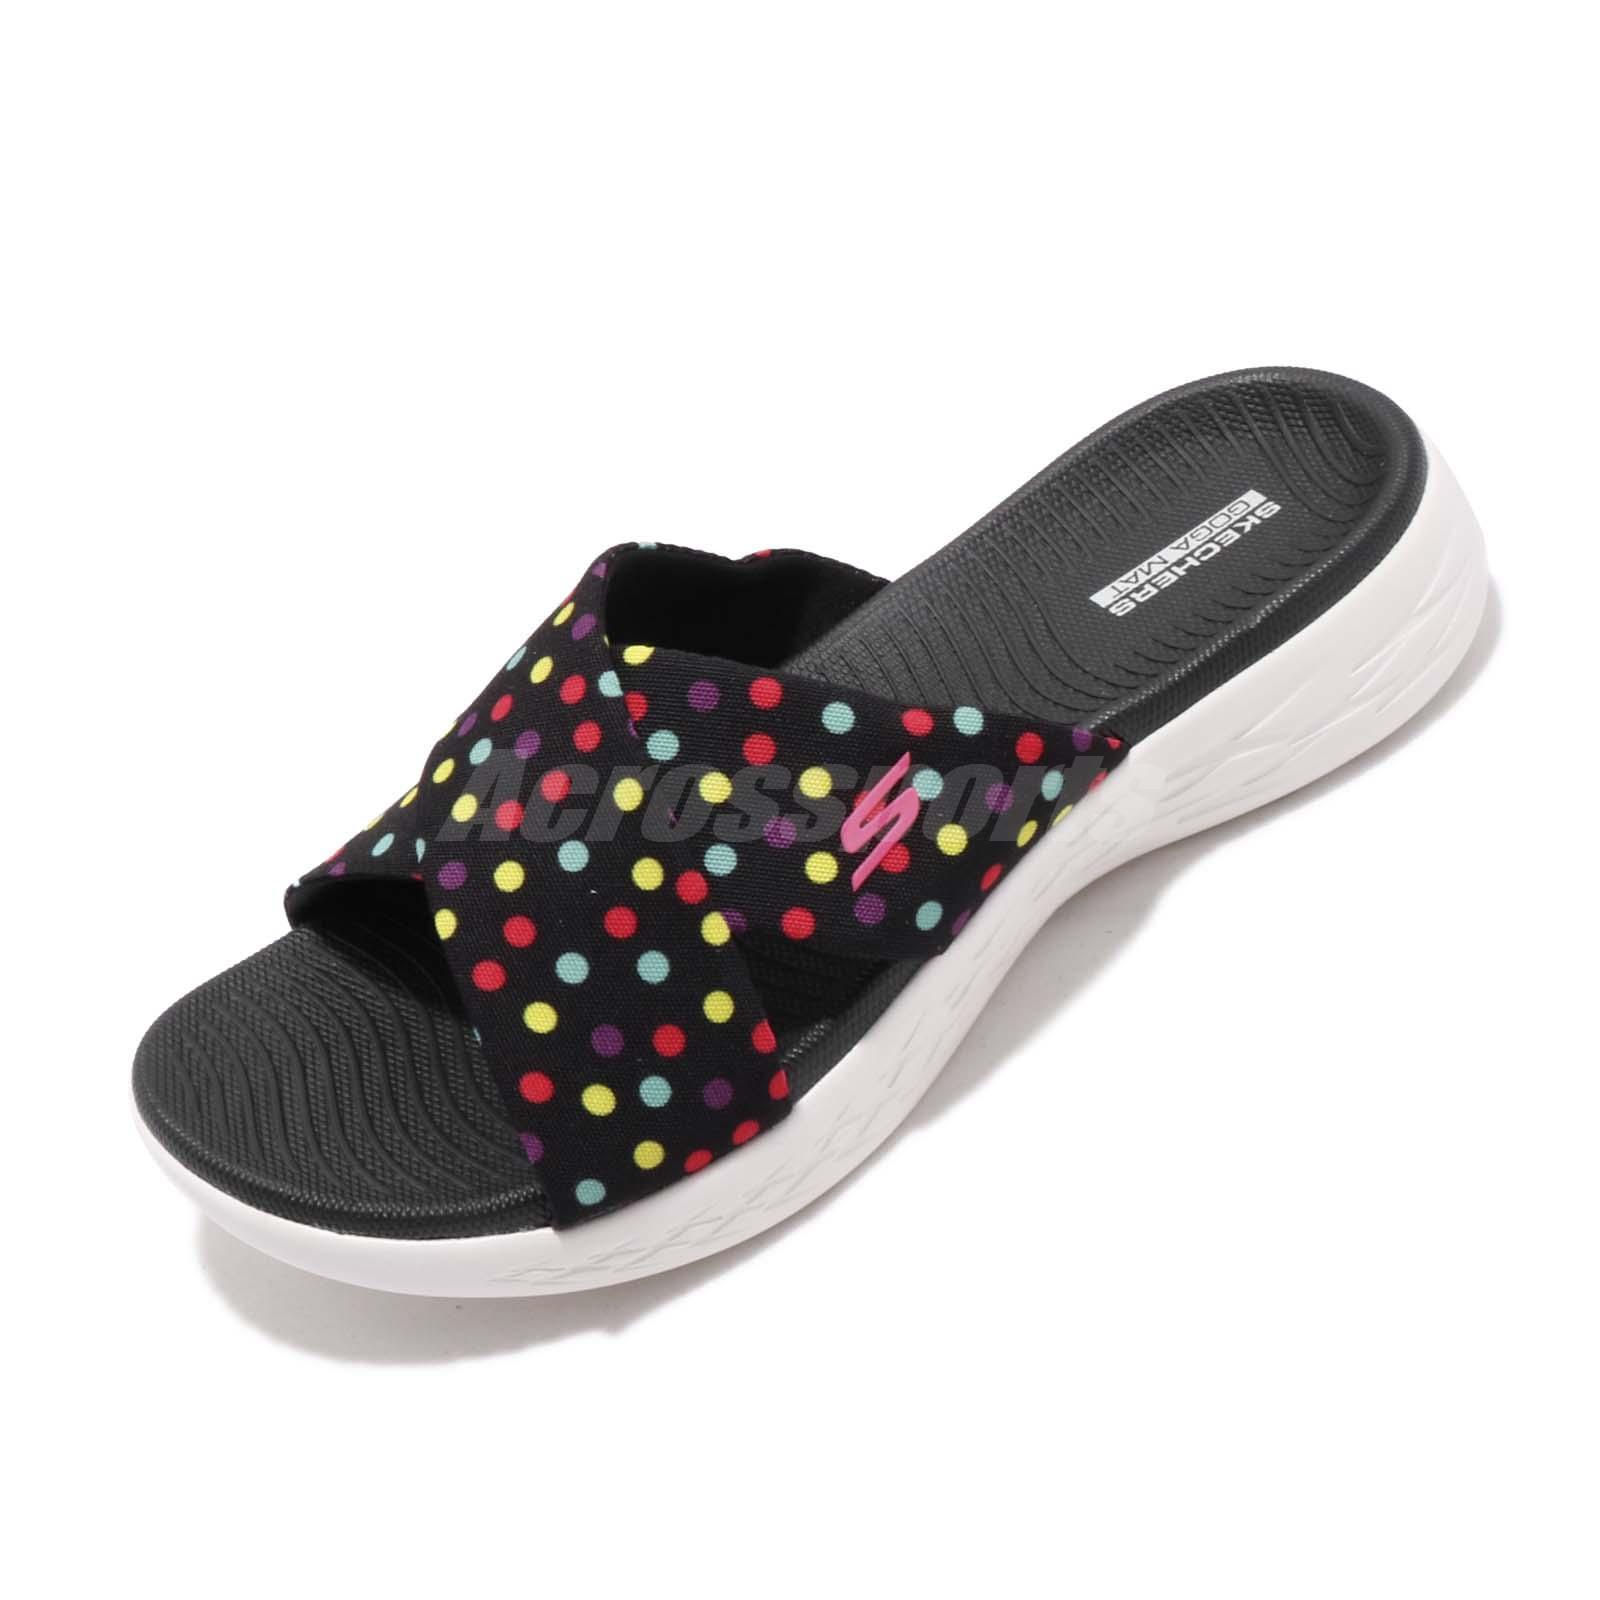 Details about Skechers On The Go 600-Kaleidoscope Black Dots Print Womens  Sandal 16171-BKMT